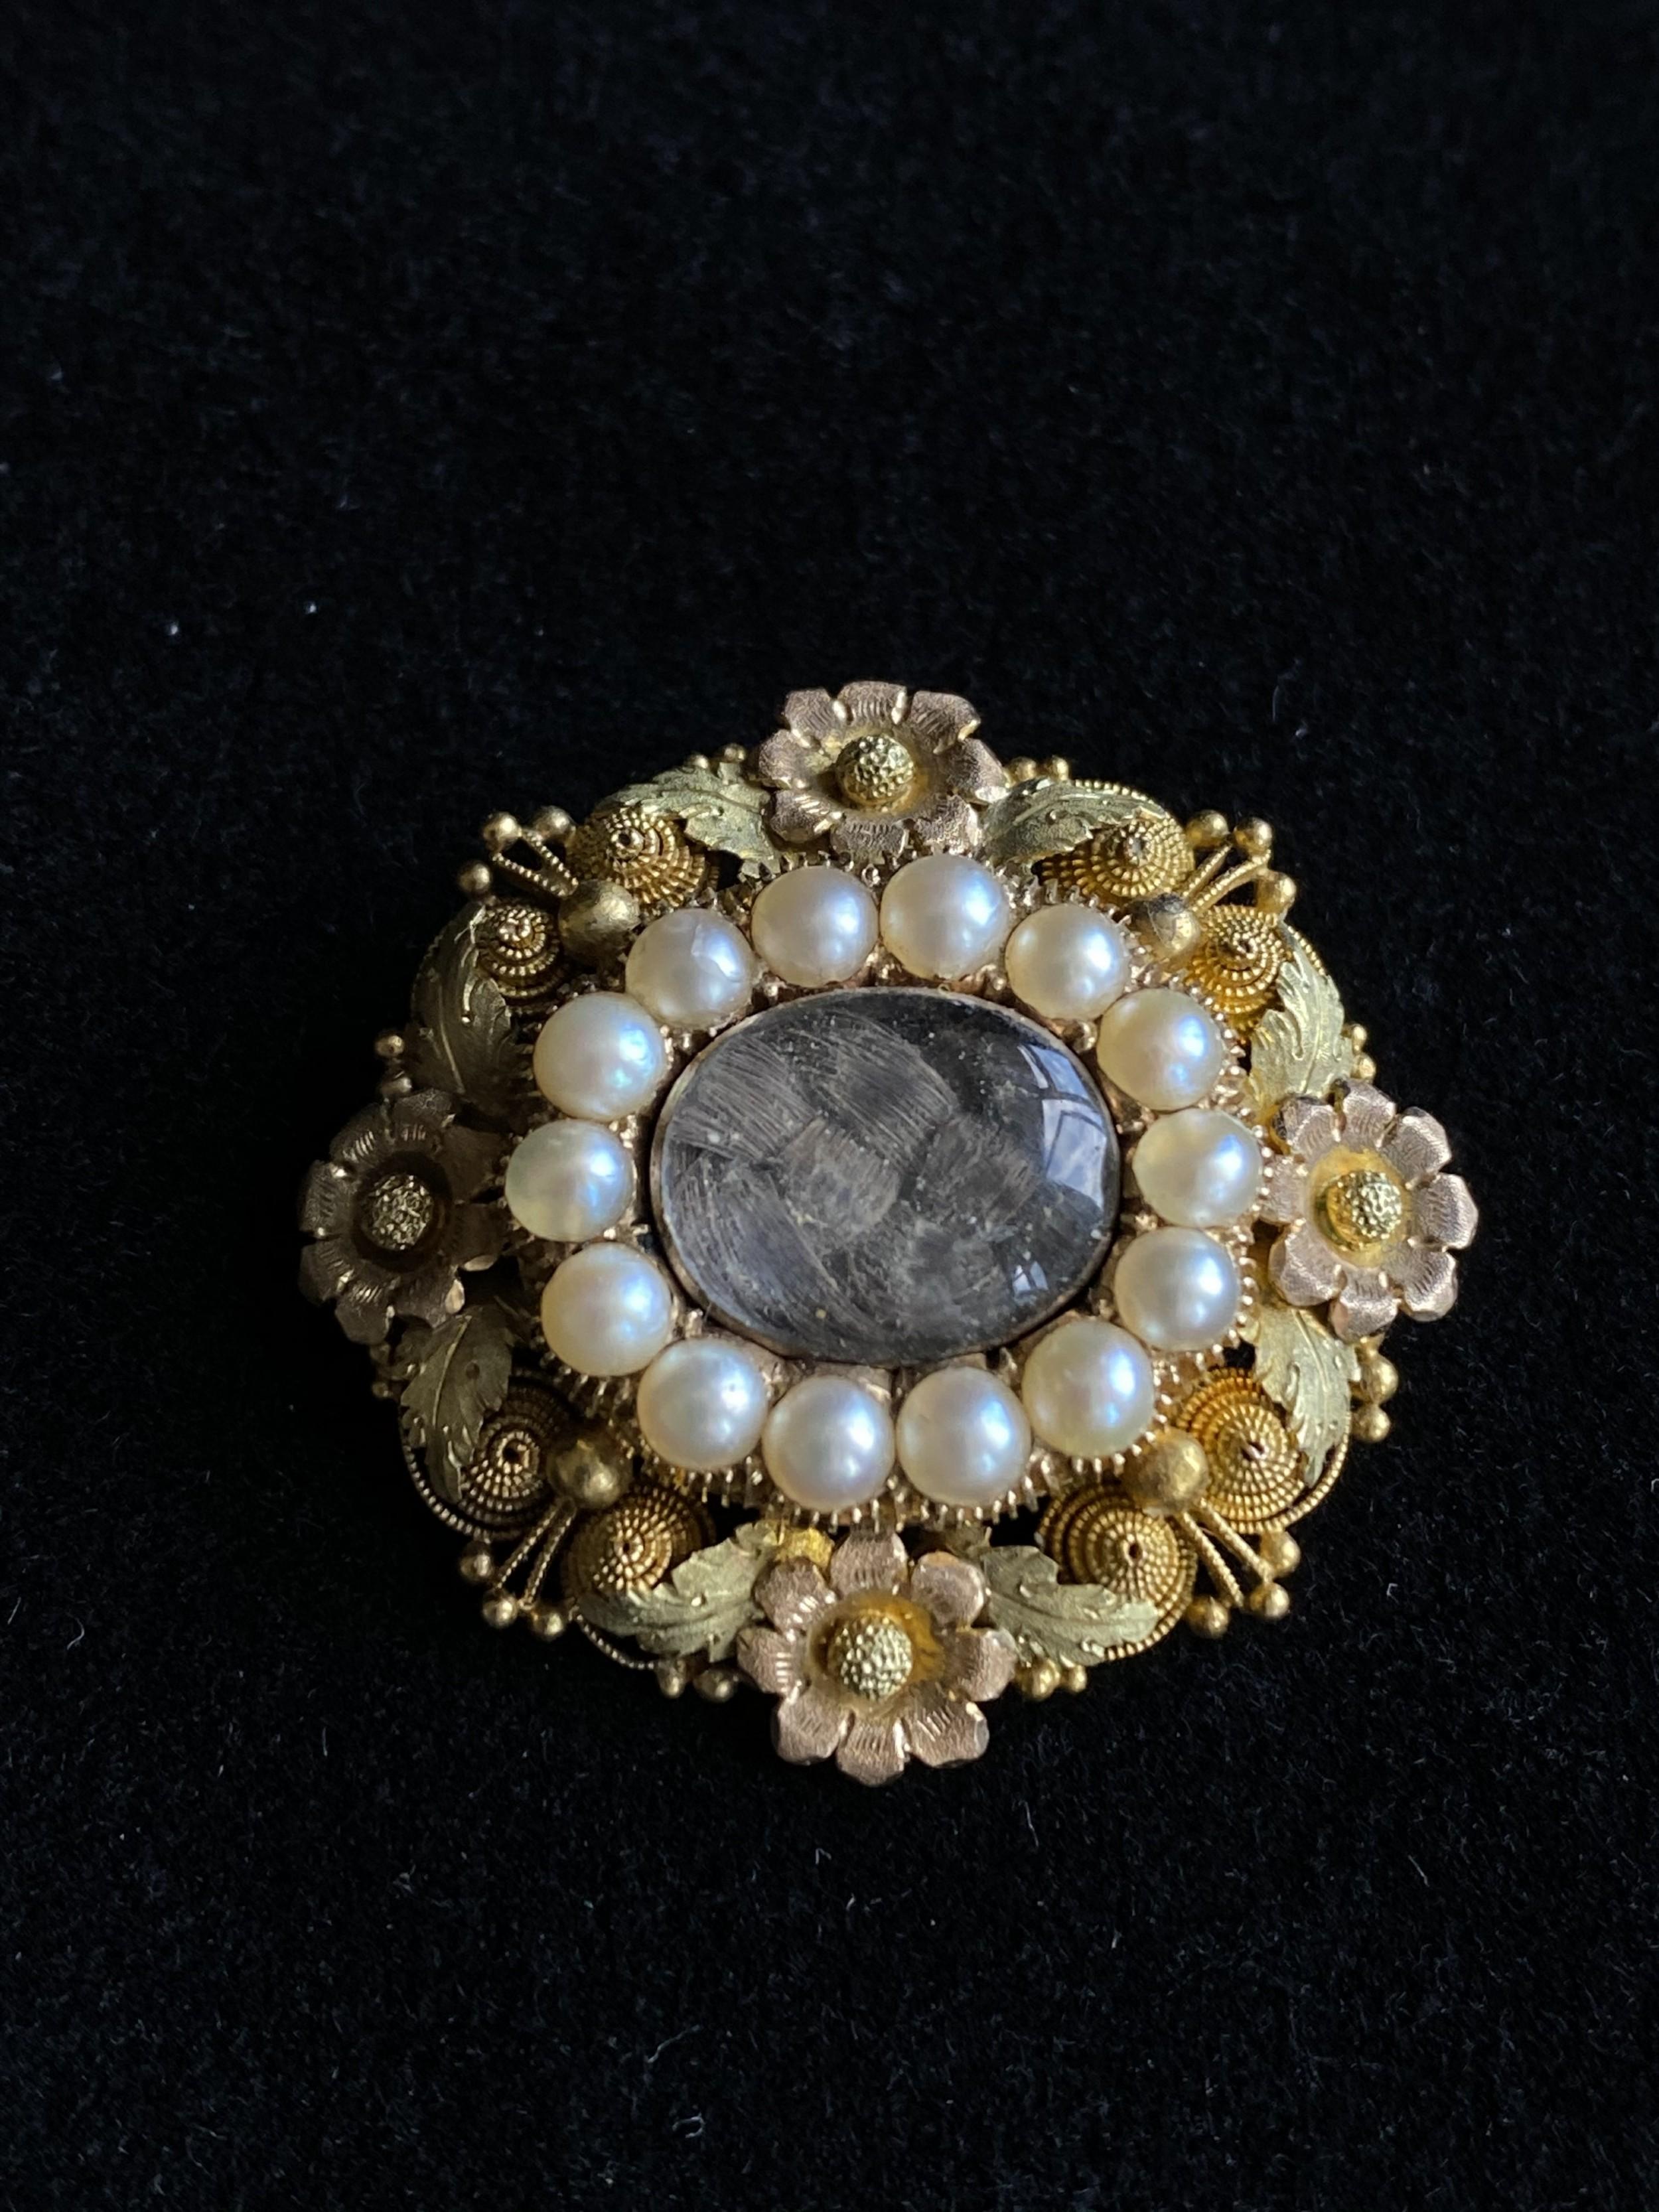 georgian inmemoriam brooch